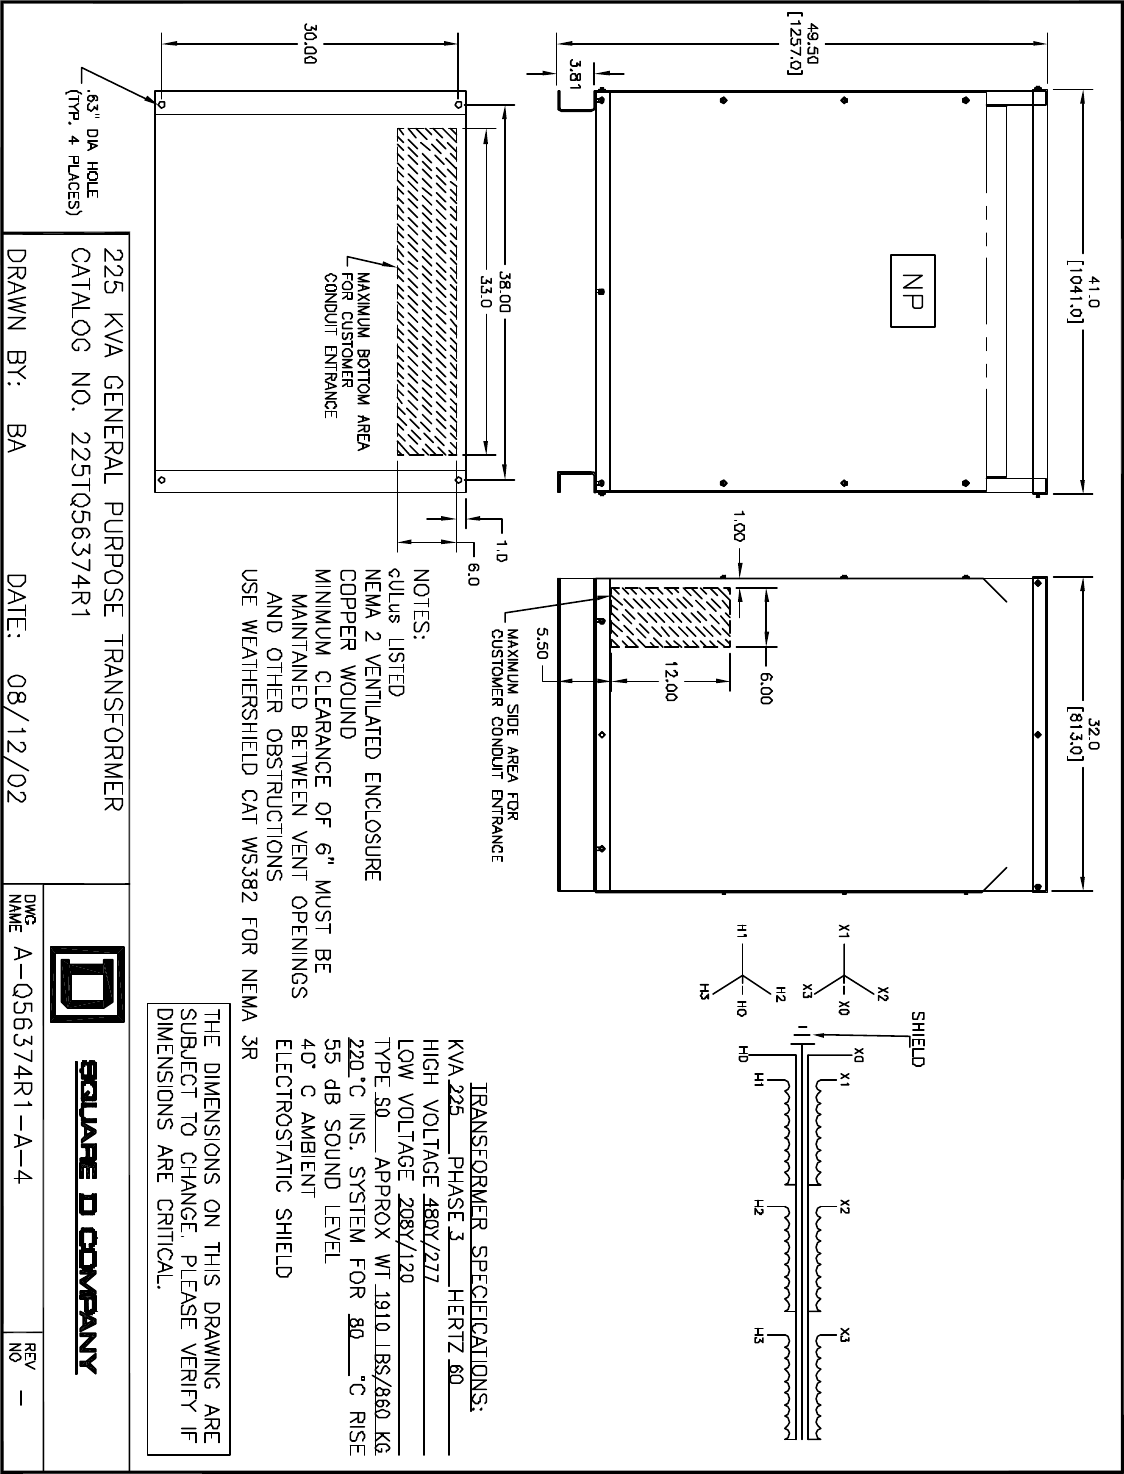 Xantrex Pv 225208 Users Manual N on